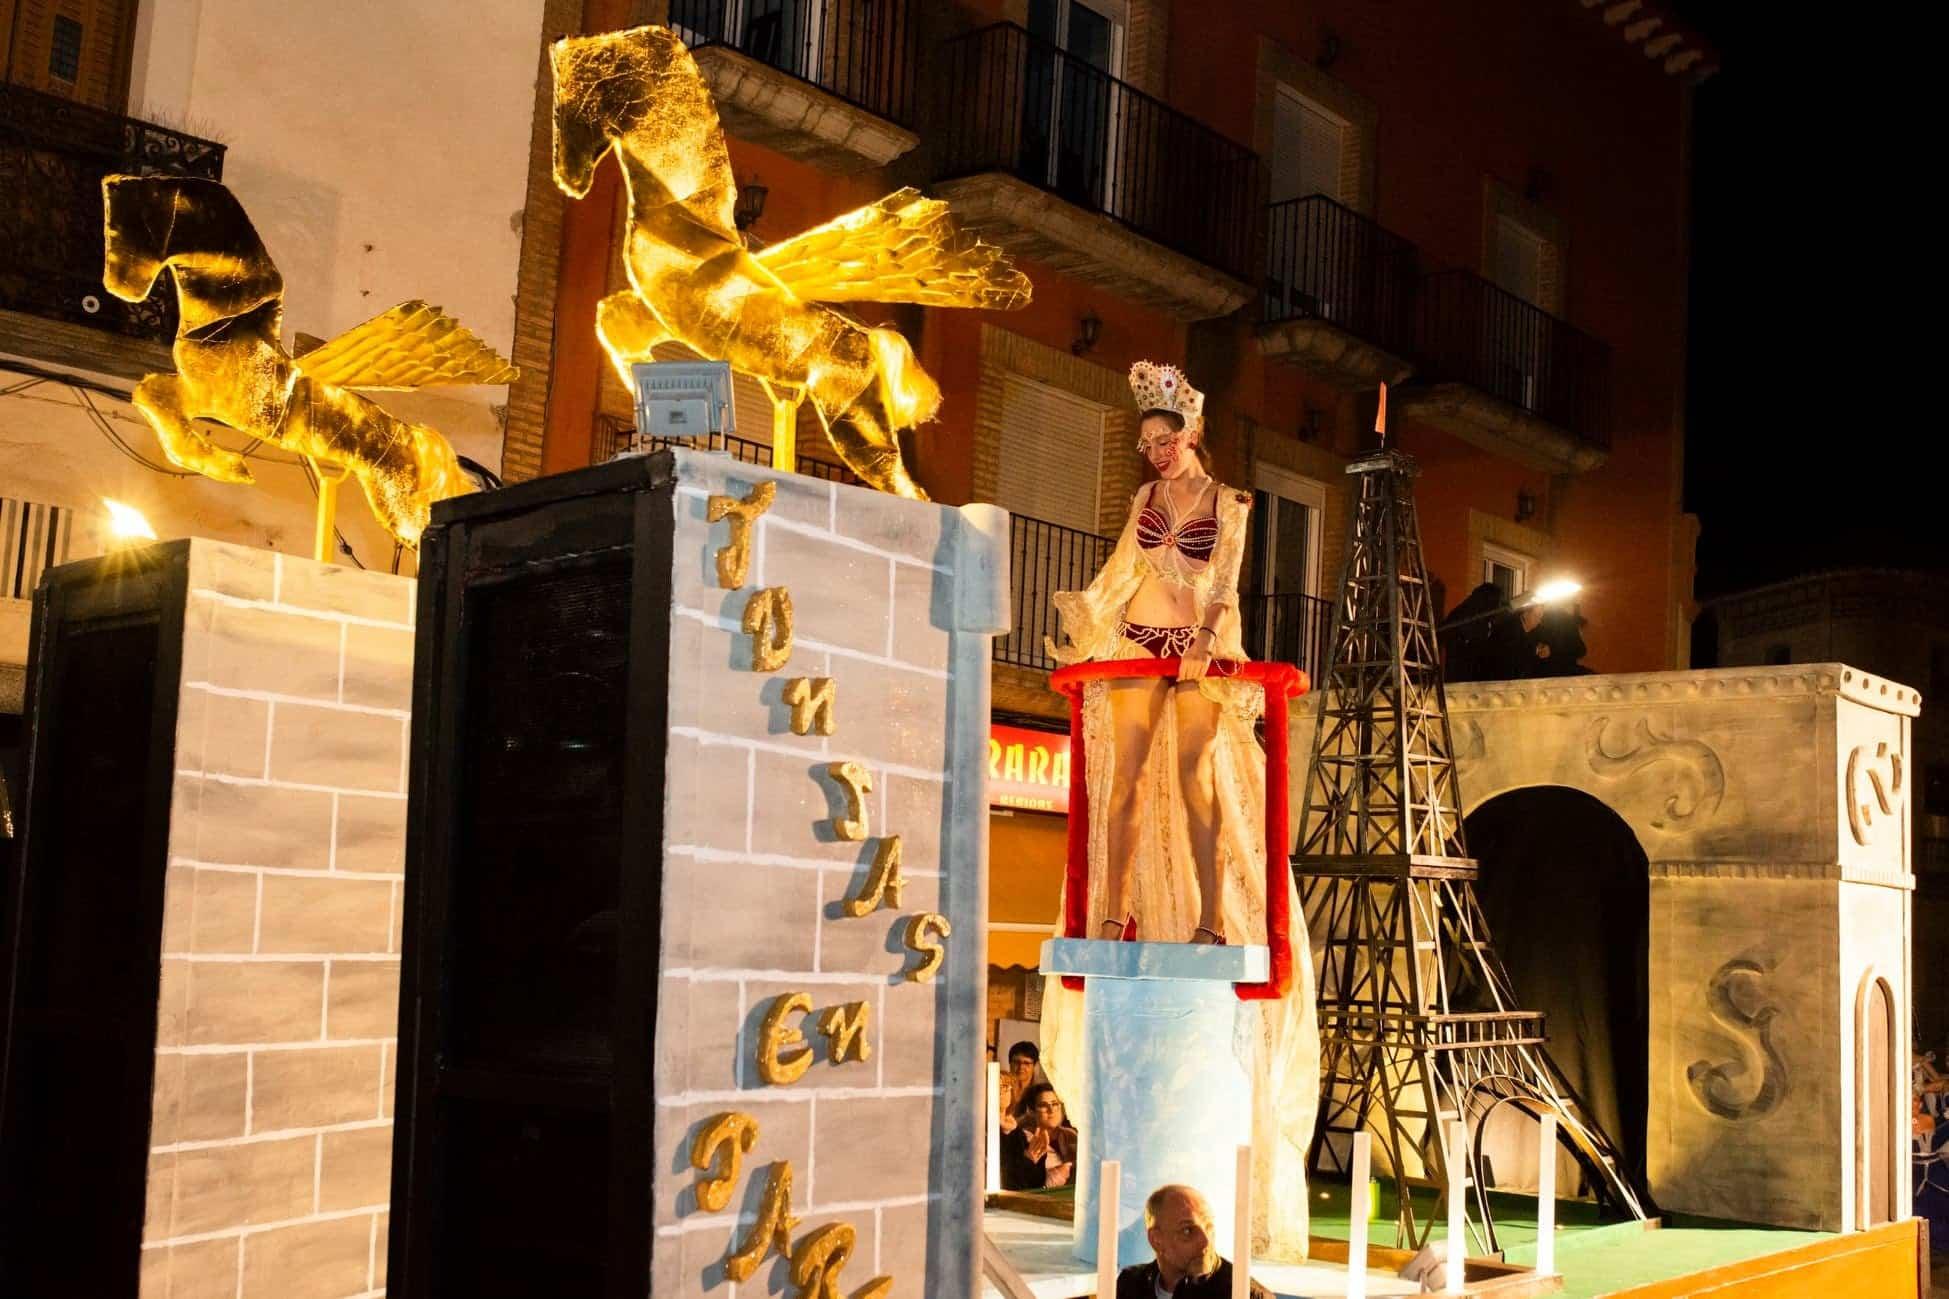 Carnaval de herencia 2020 ofertorio 83 - Selección de fotografías del Ofertorio del Carnaval de Herencia